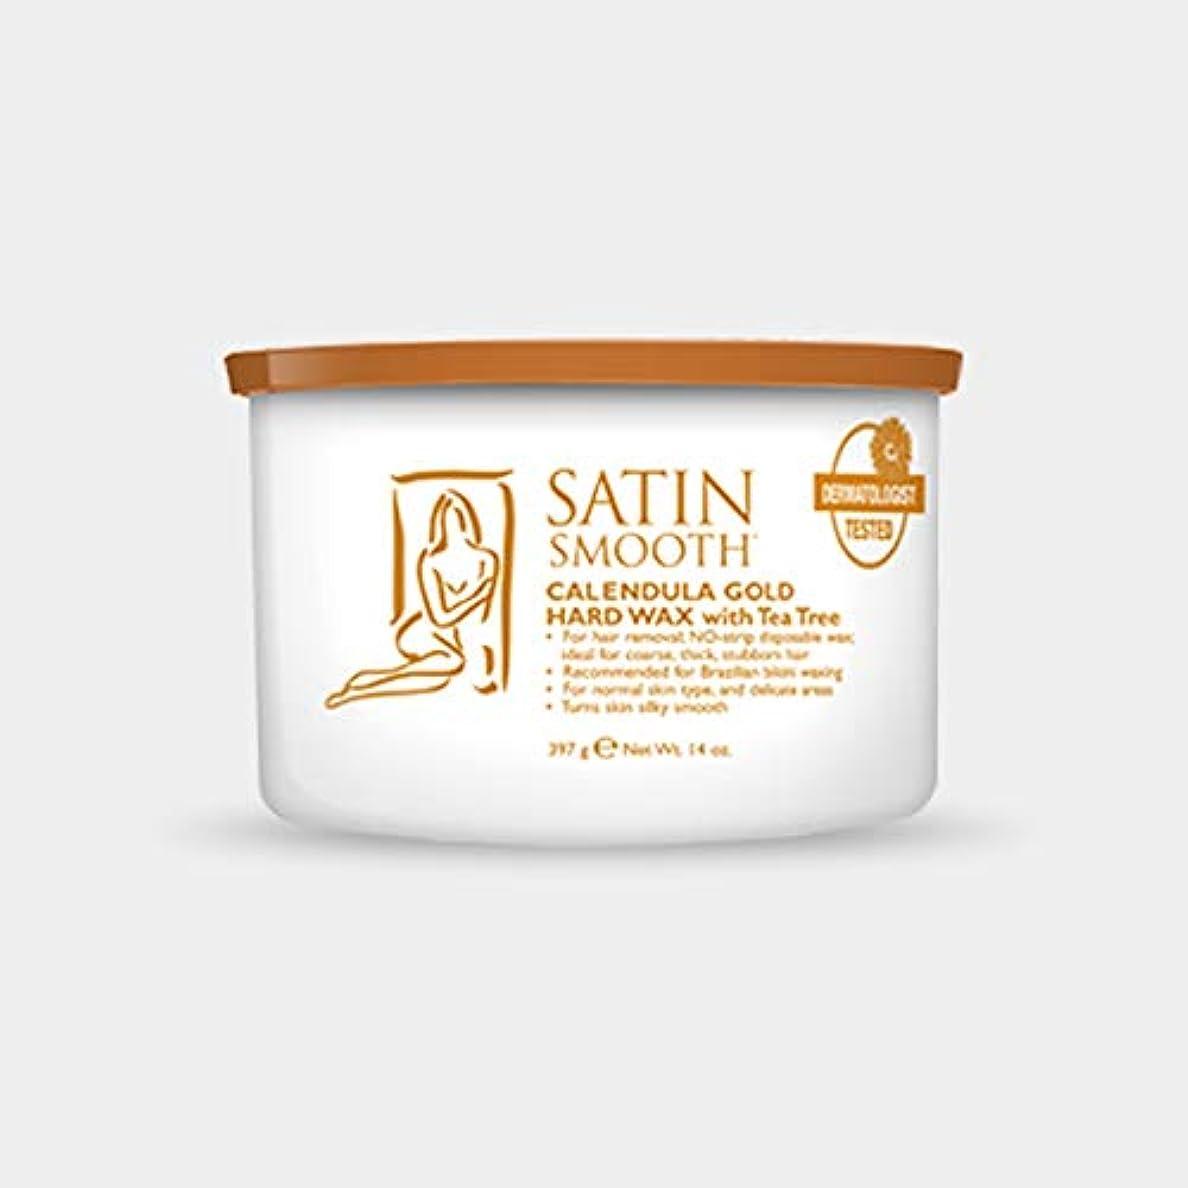 Satin Smooth Calendula Gold Hard Wax With Tea Tree Oil (並行輸入品)